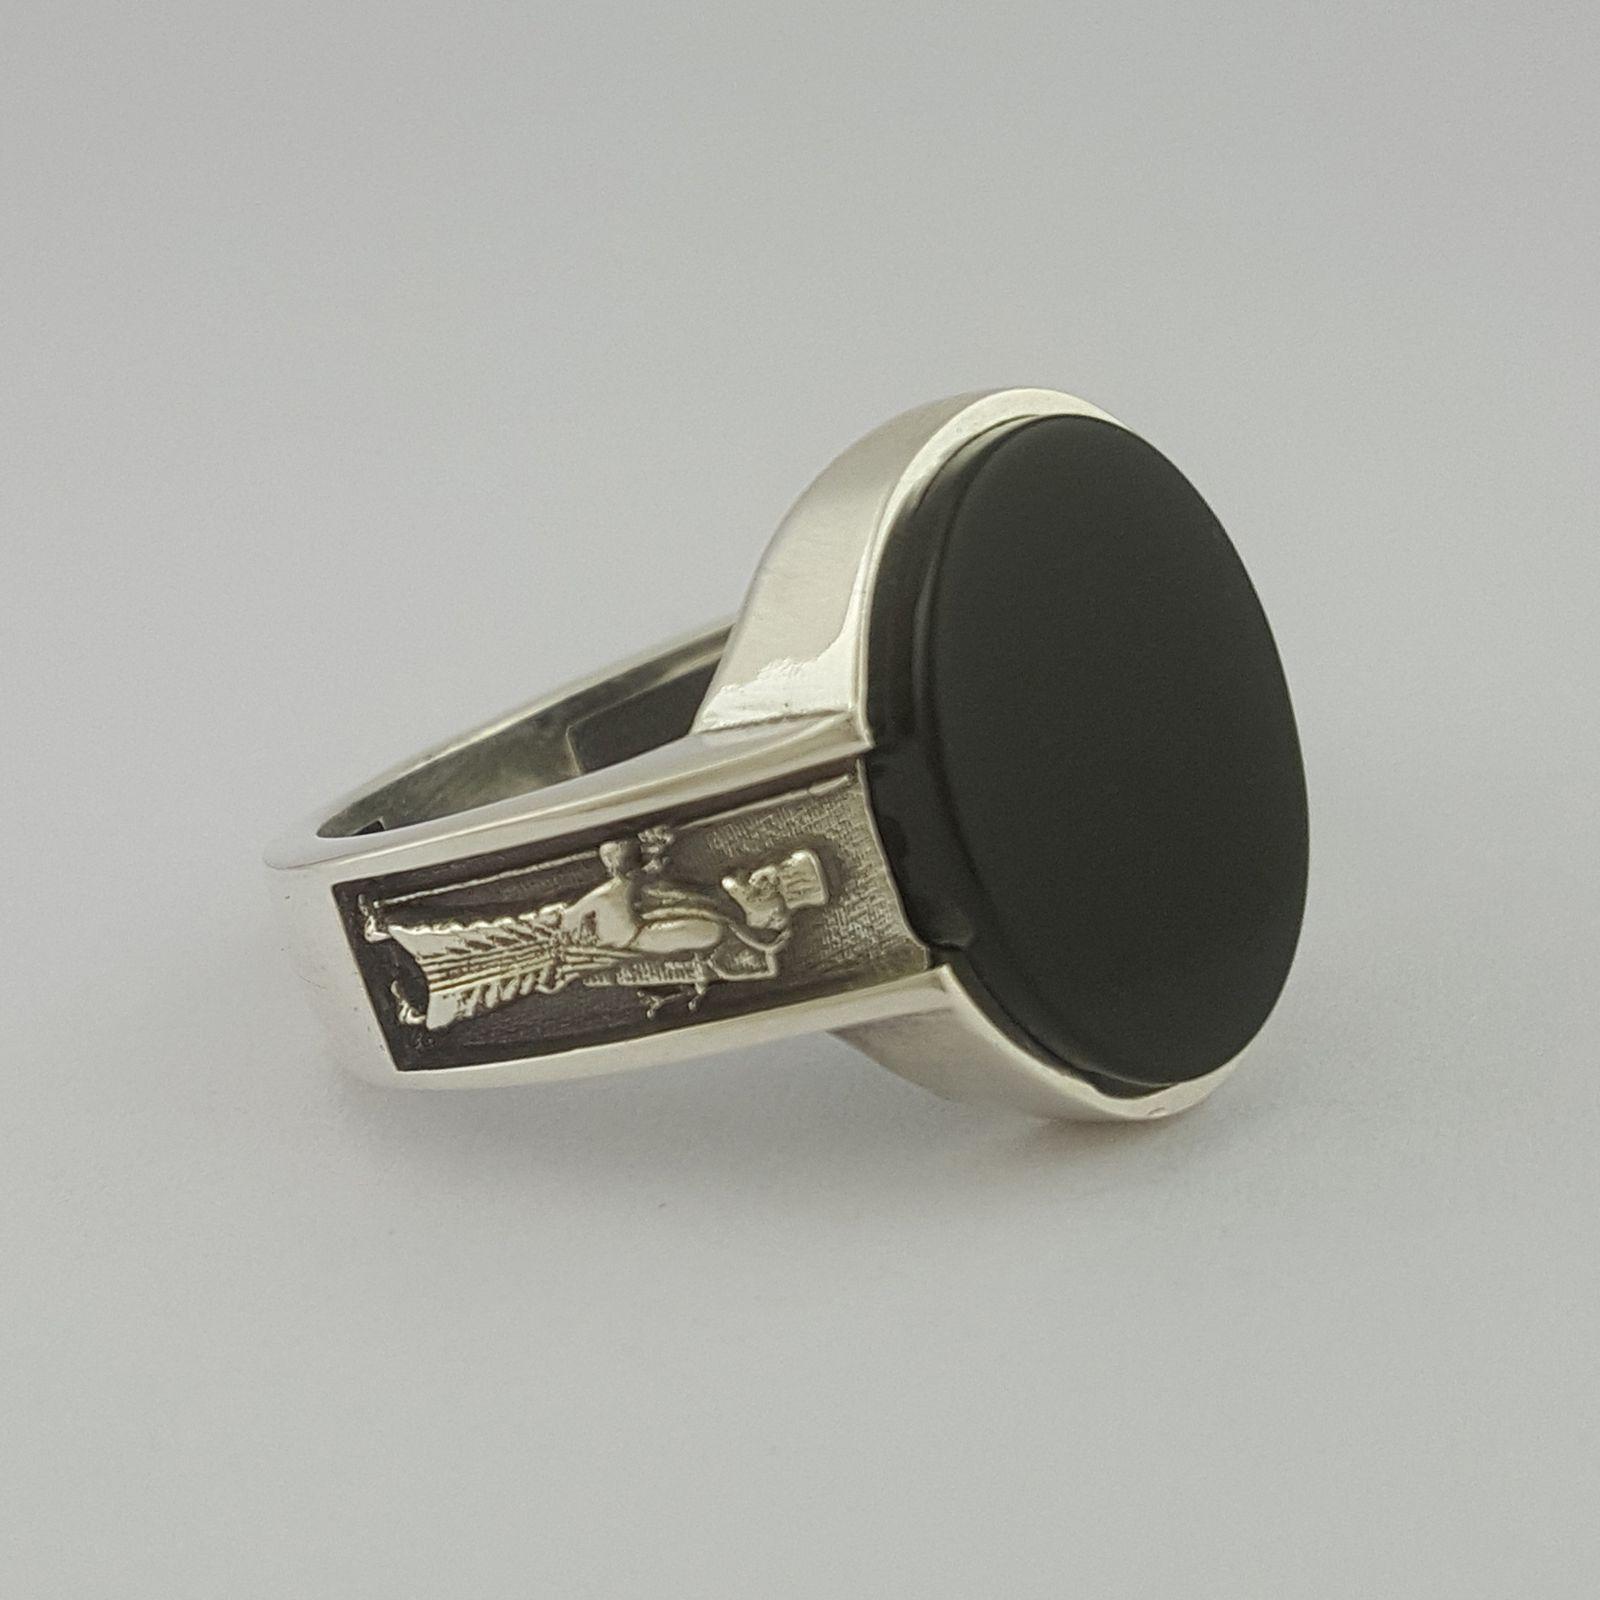 انگشتر نقره مردانه بلو استون کد 1069-65 -  - 4